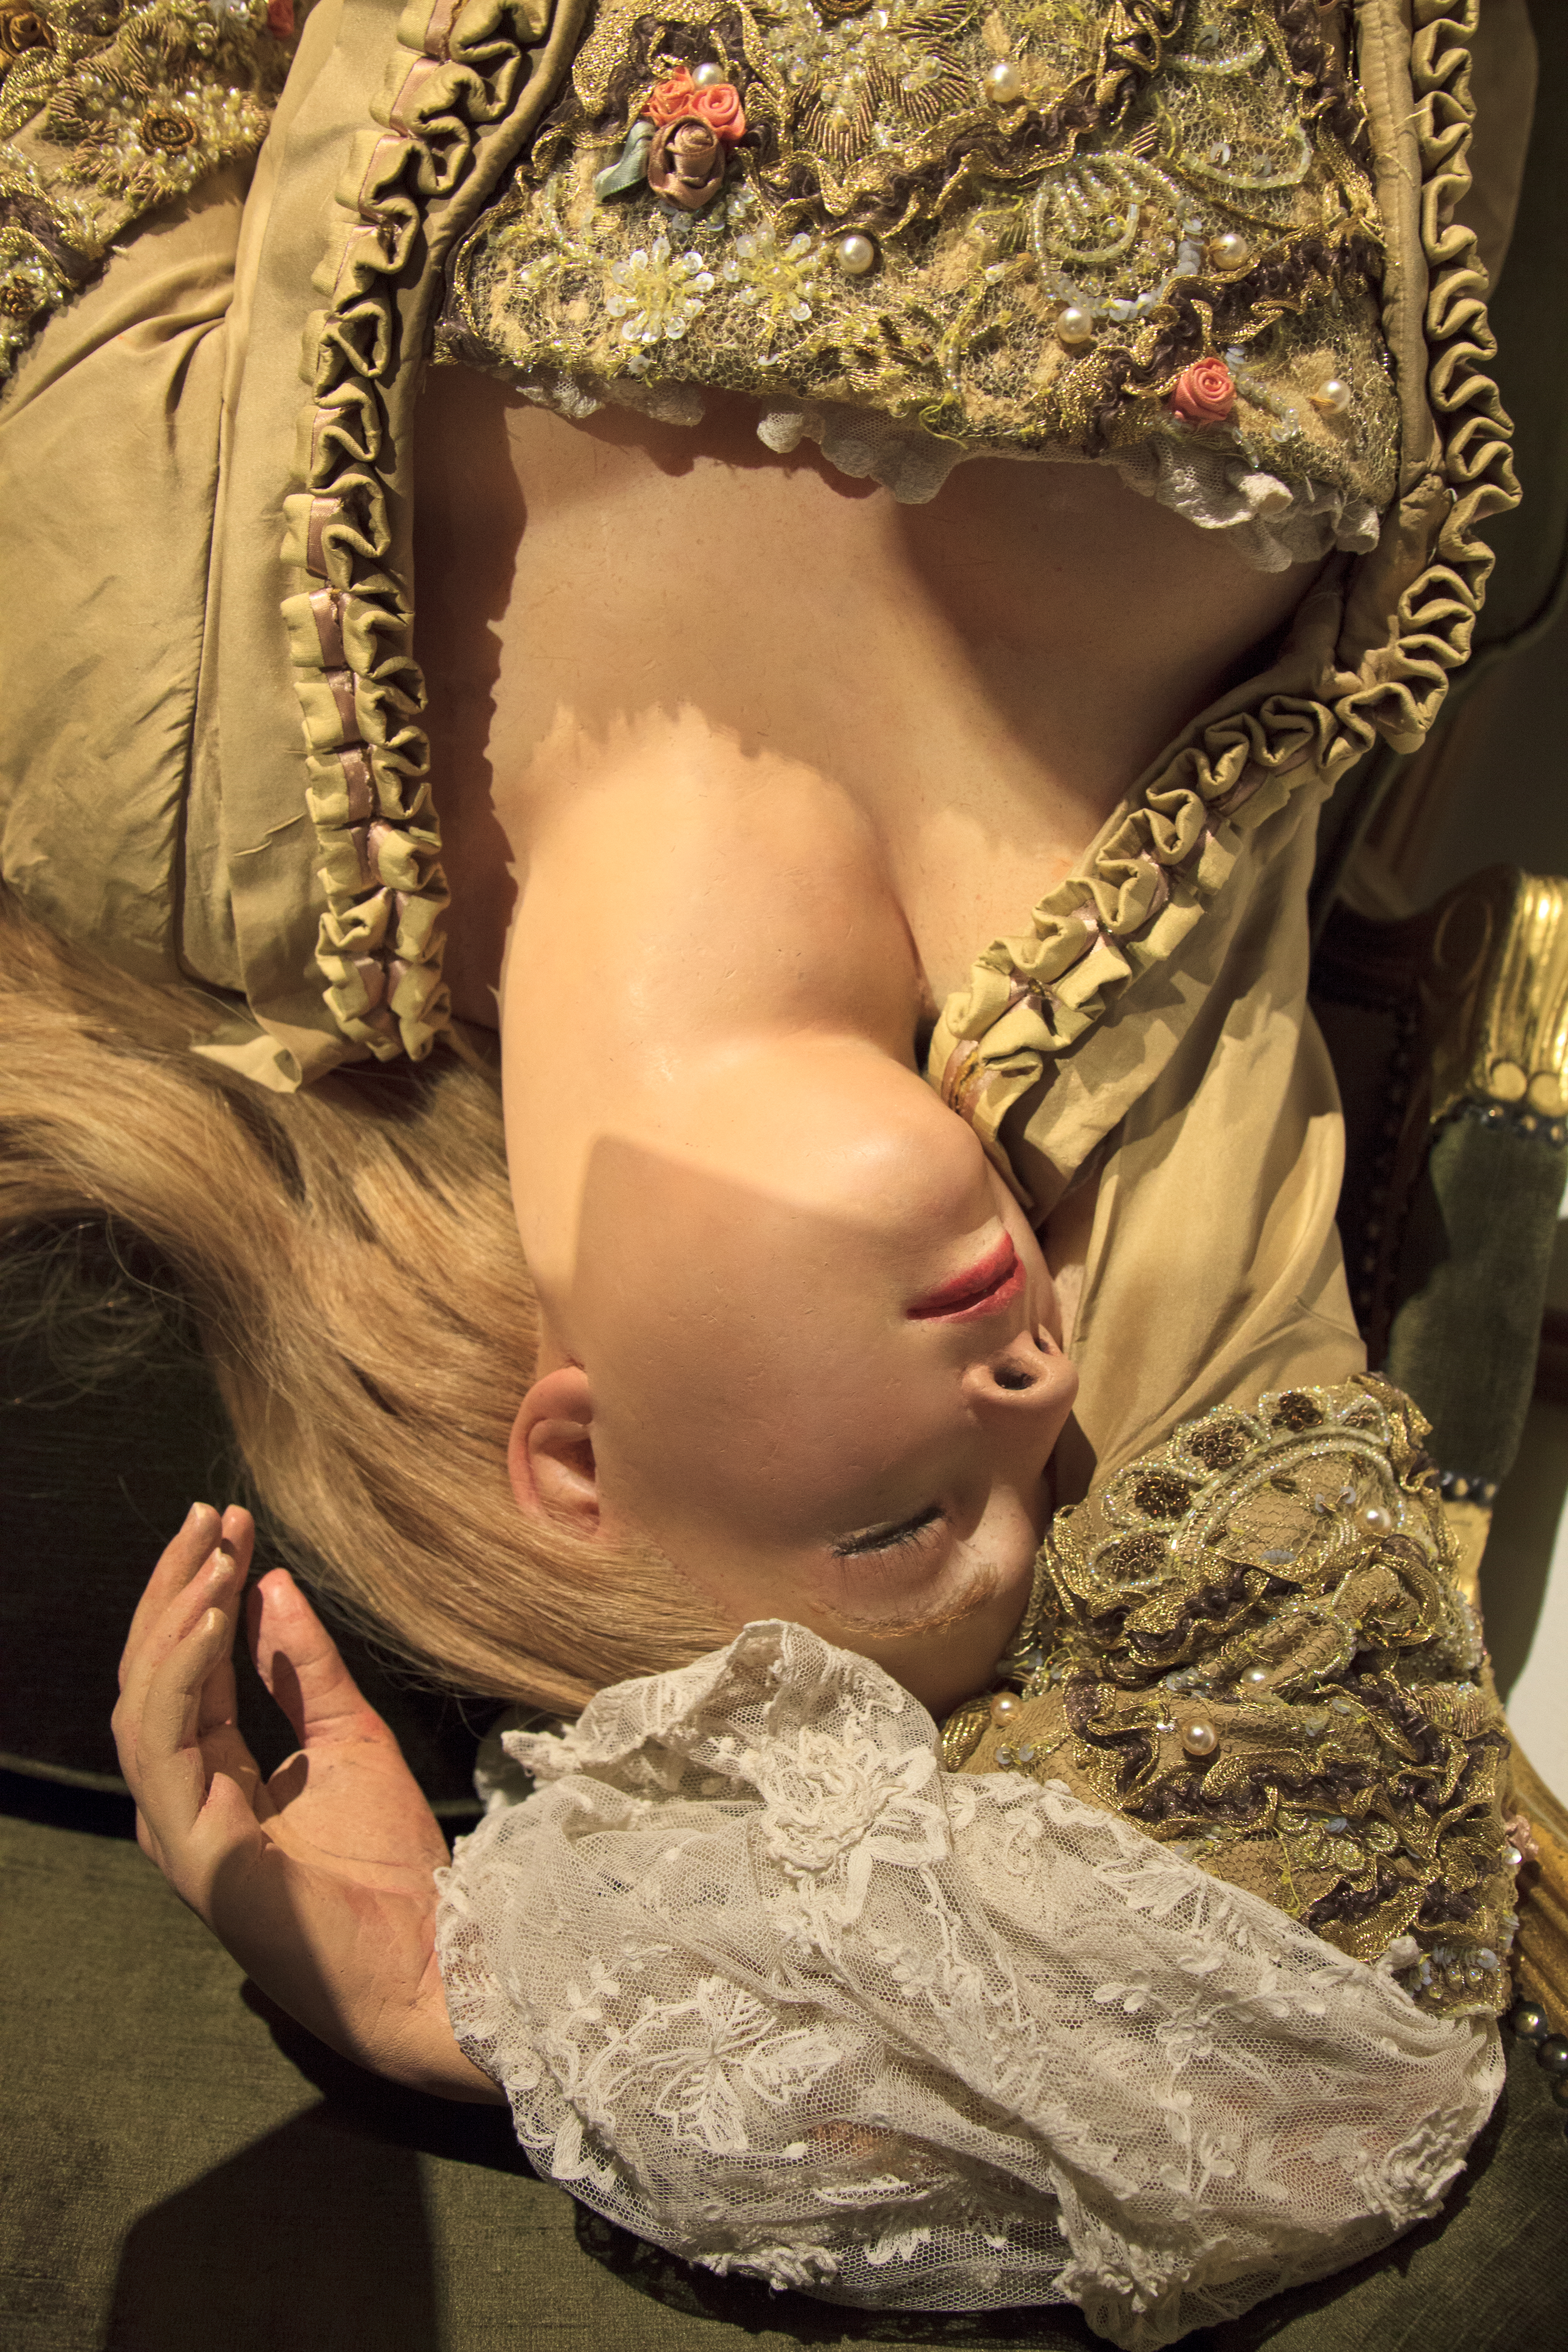 p175. Sleeping Beauty